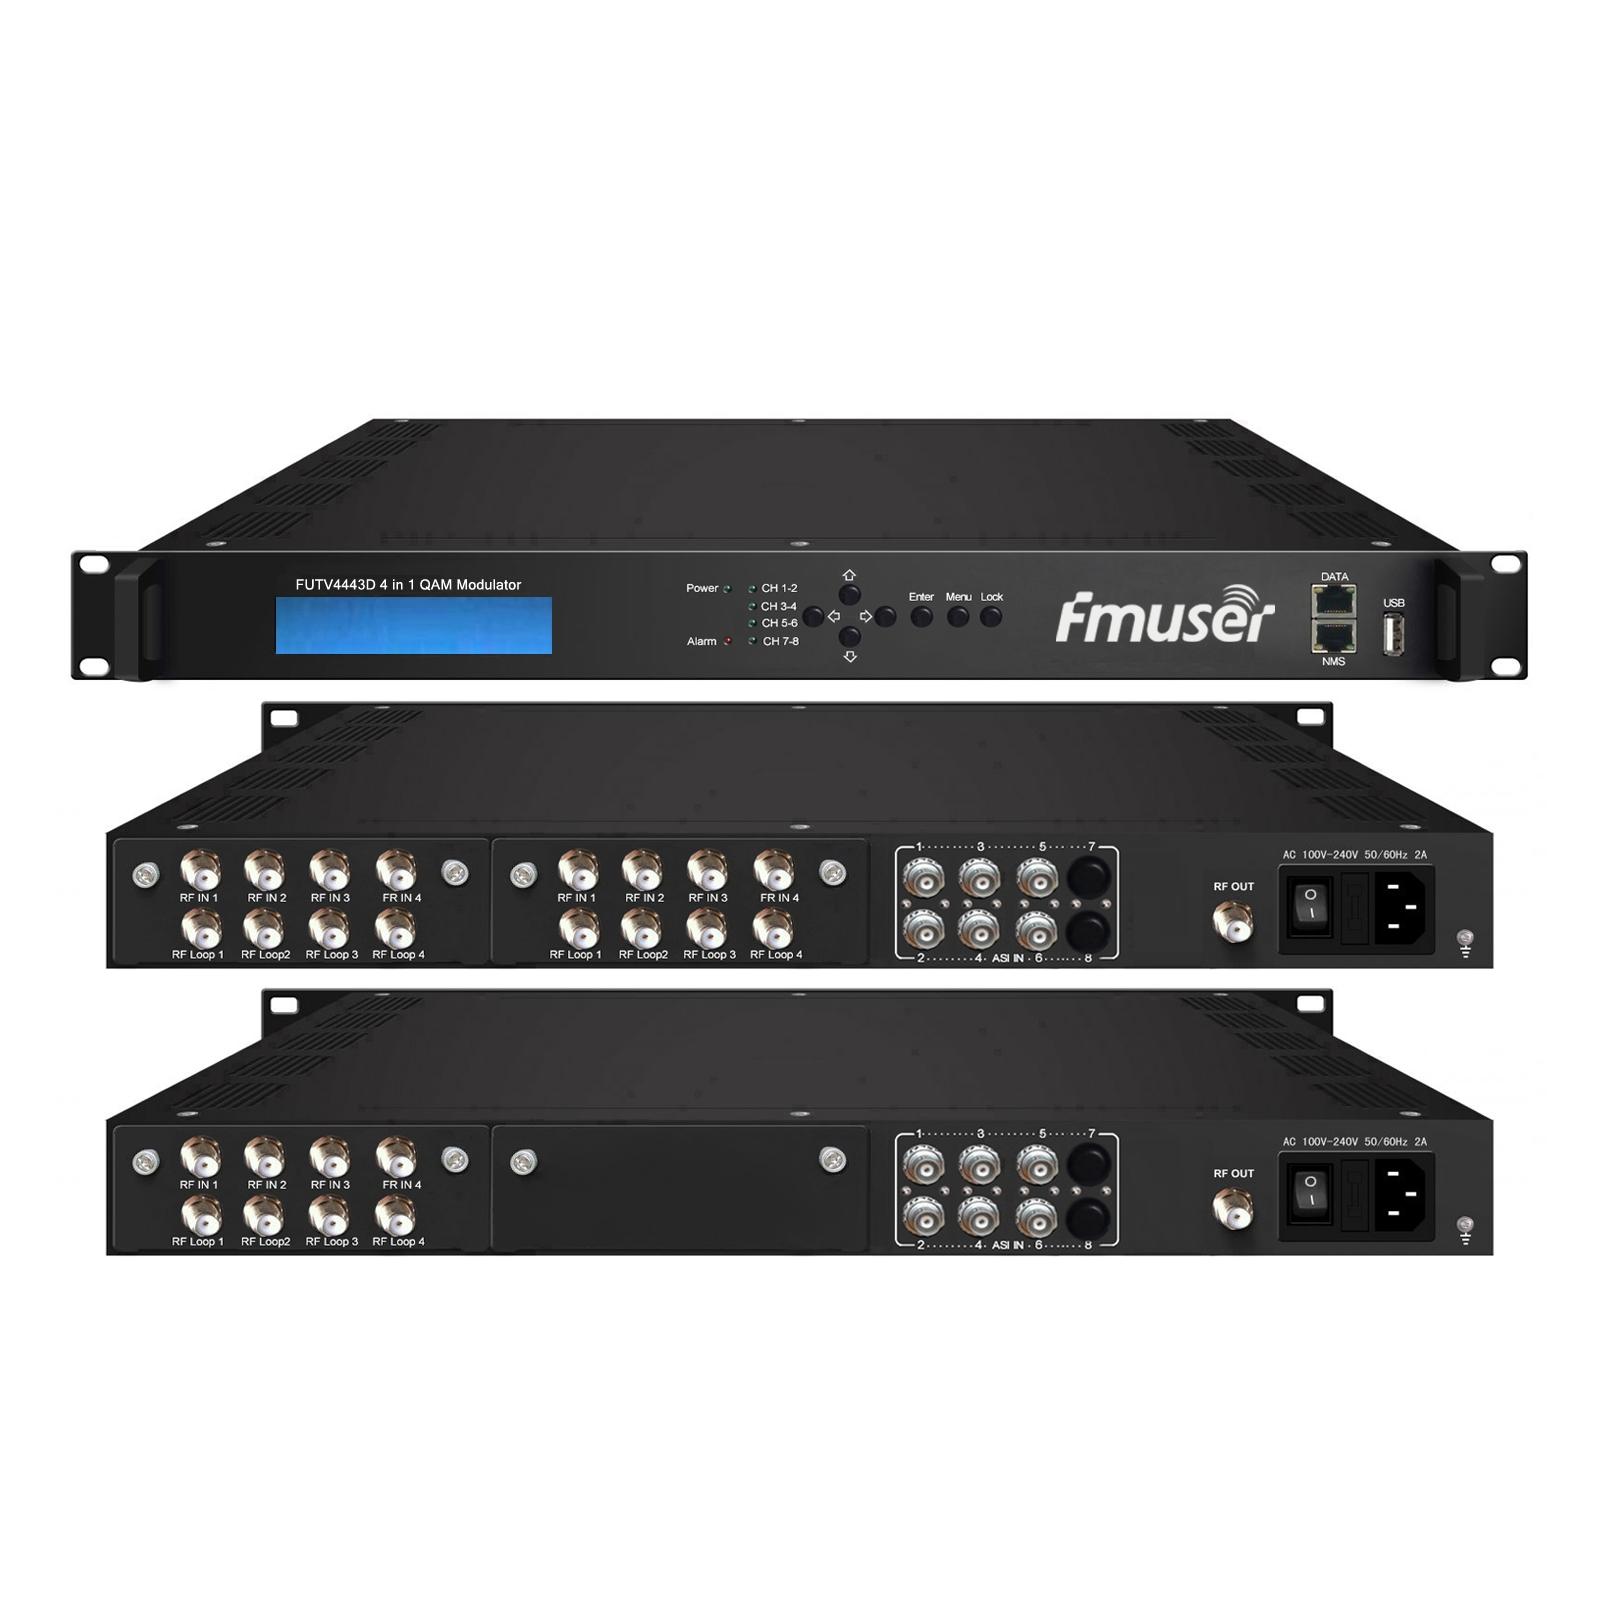 Fmuser FUTV4443D 4 1 katika Mux-scrambling QAM moduleta (8Tuner + 6 * ASI katika, 4Tuner + 6 * ASI + 2 * IP nje) na mtandao managementtor